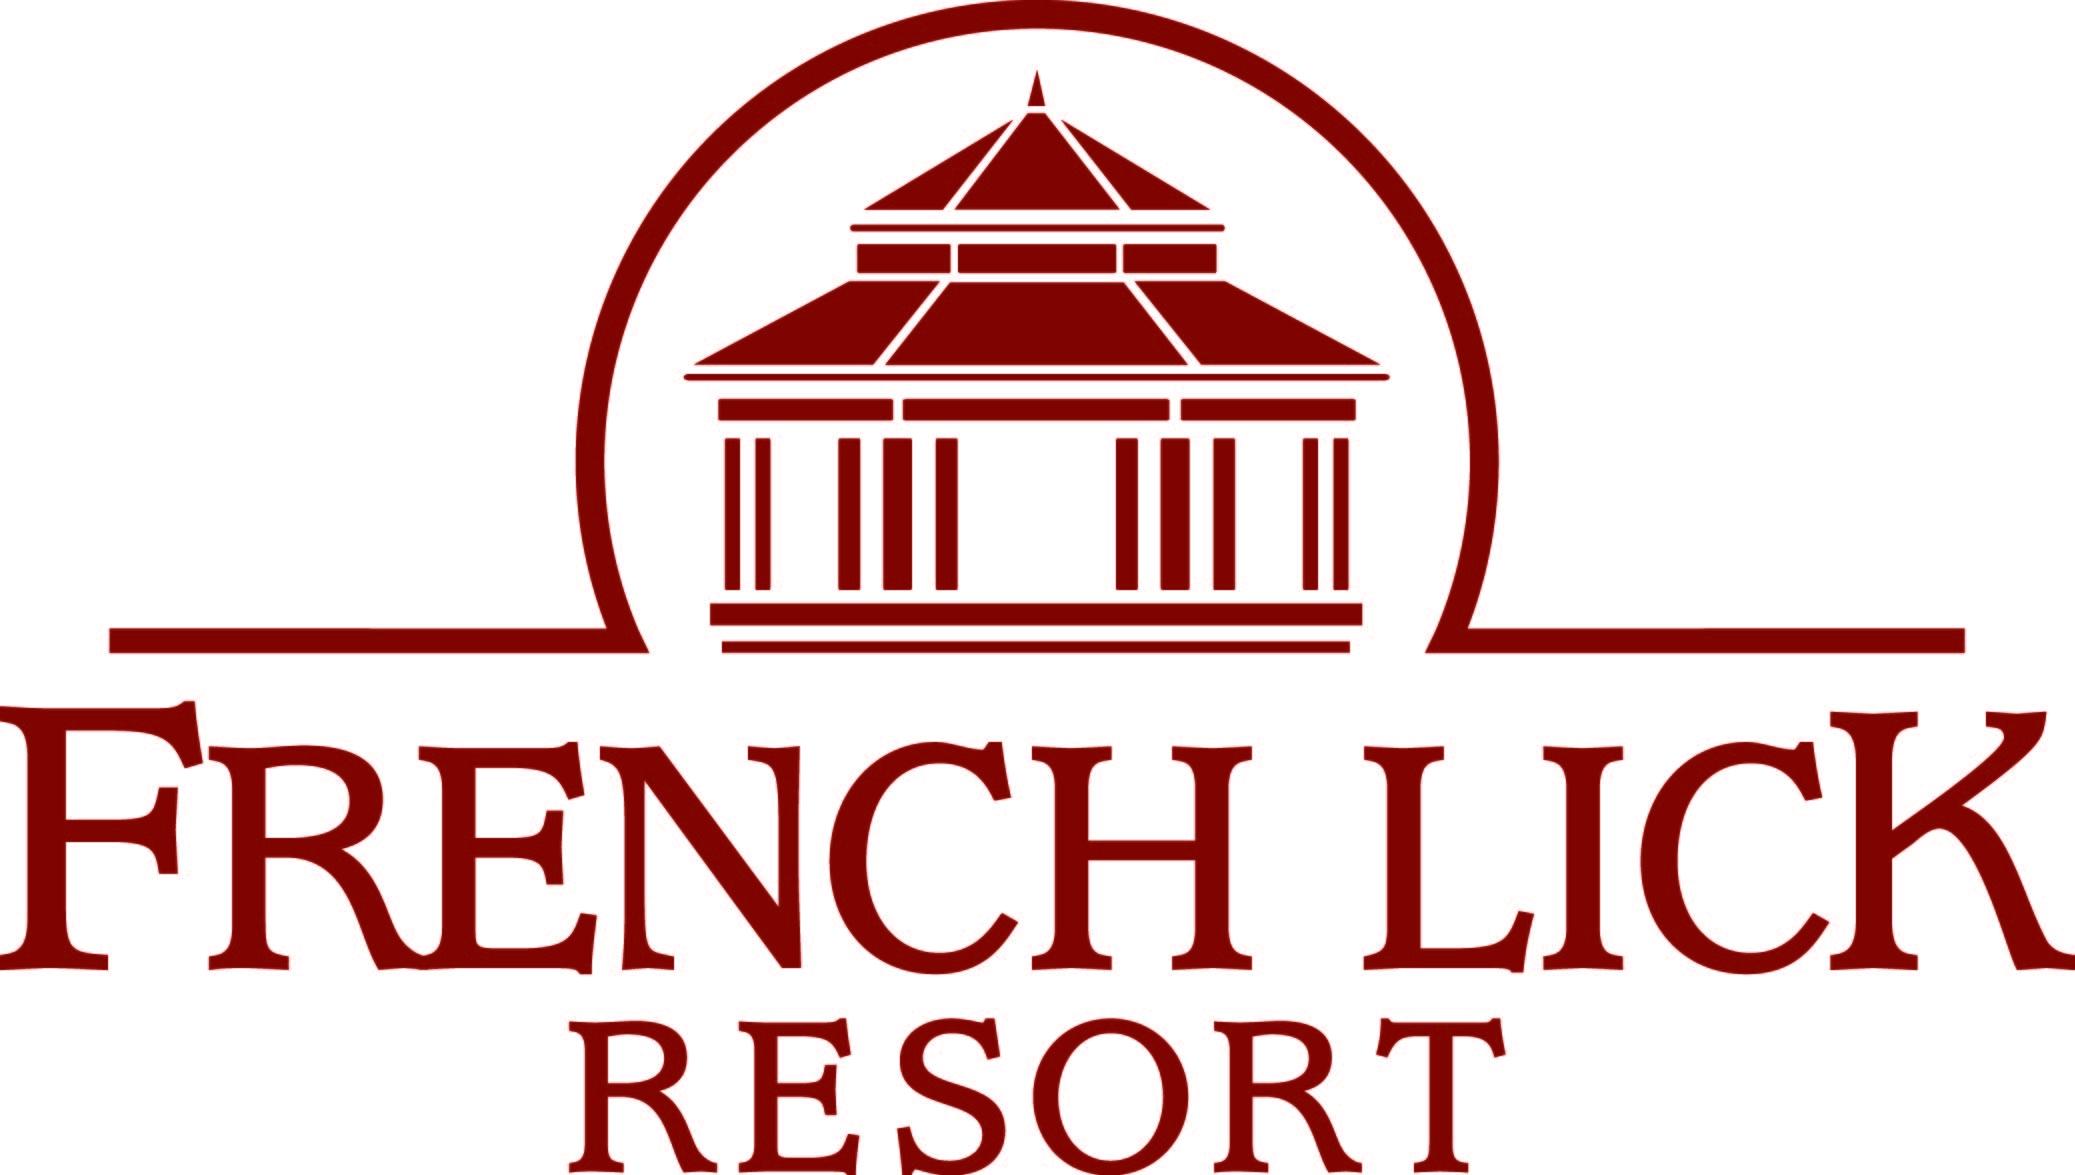 West Baden Springs Hotel Logo photo - 1